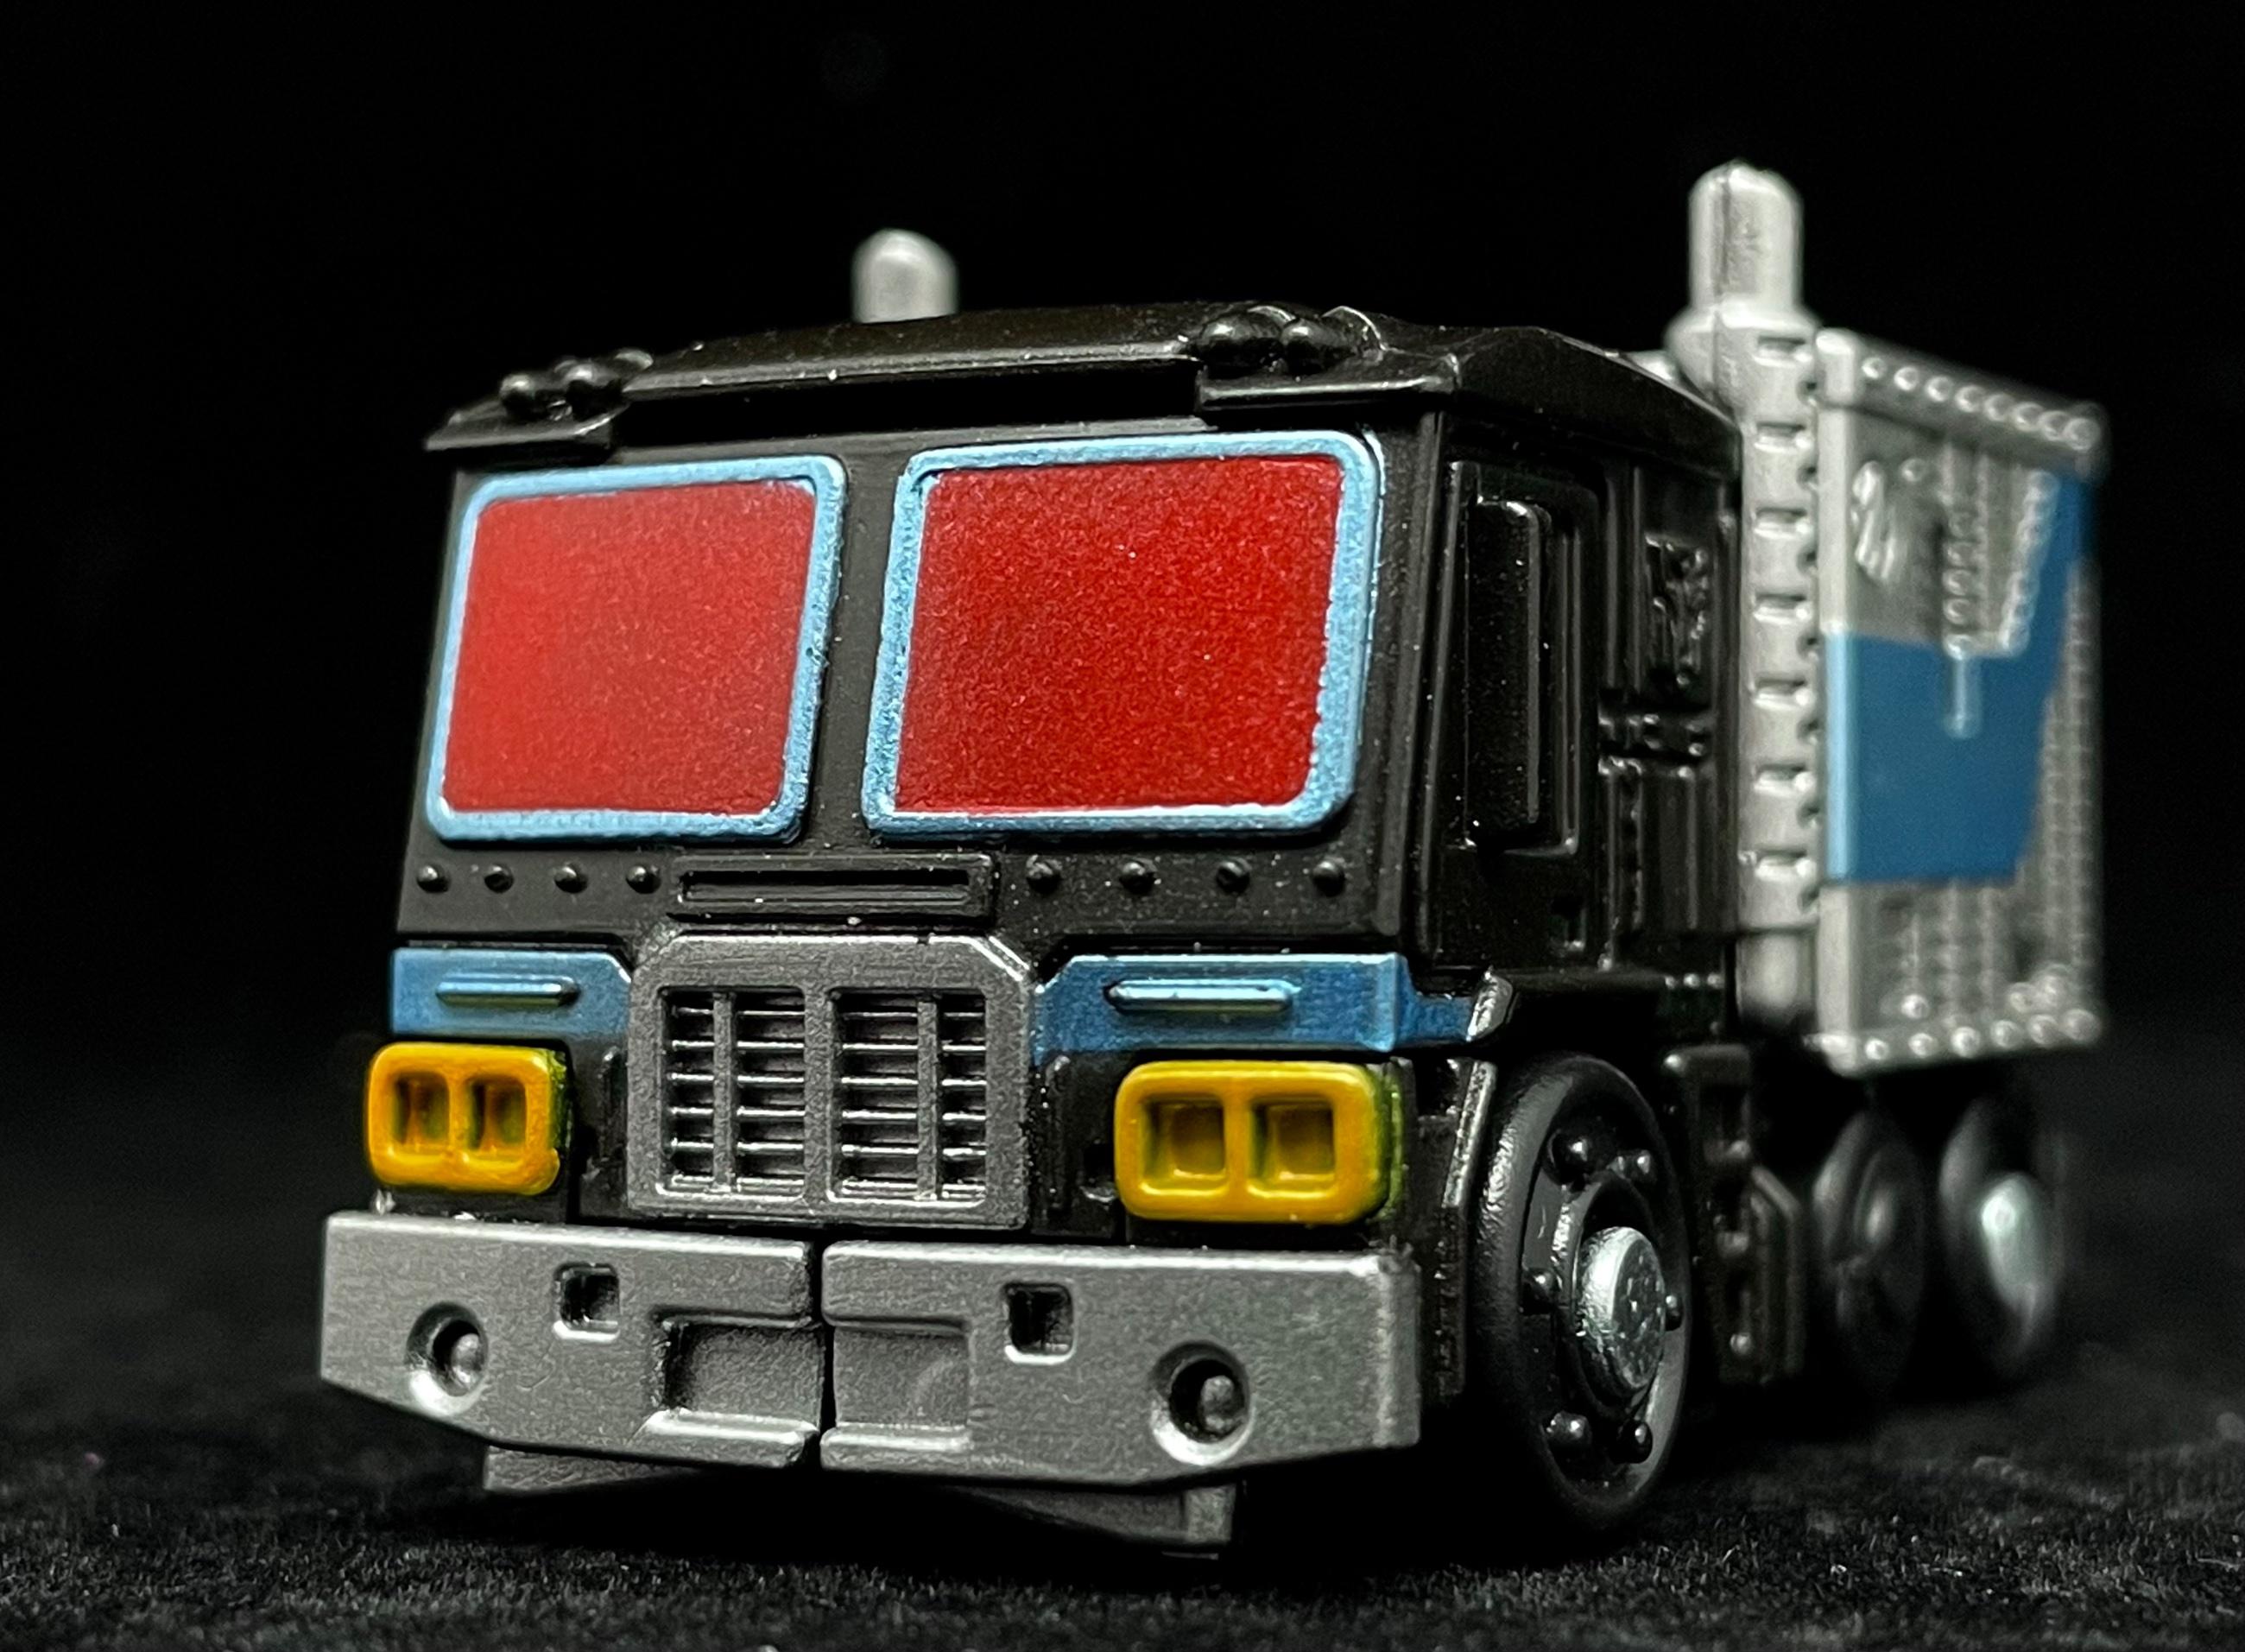 83E63FB1-9B78-42F2-A1A4-F12D05453E8A.jpeg